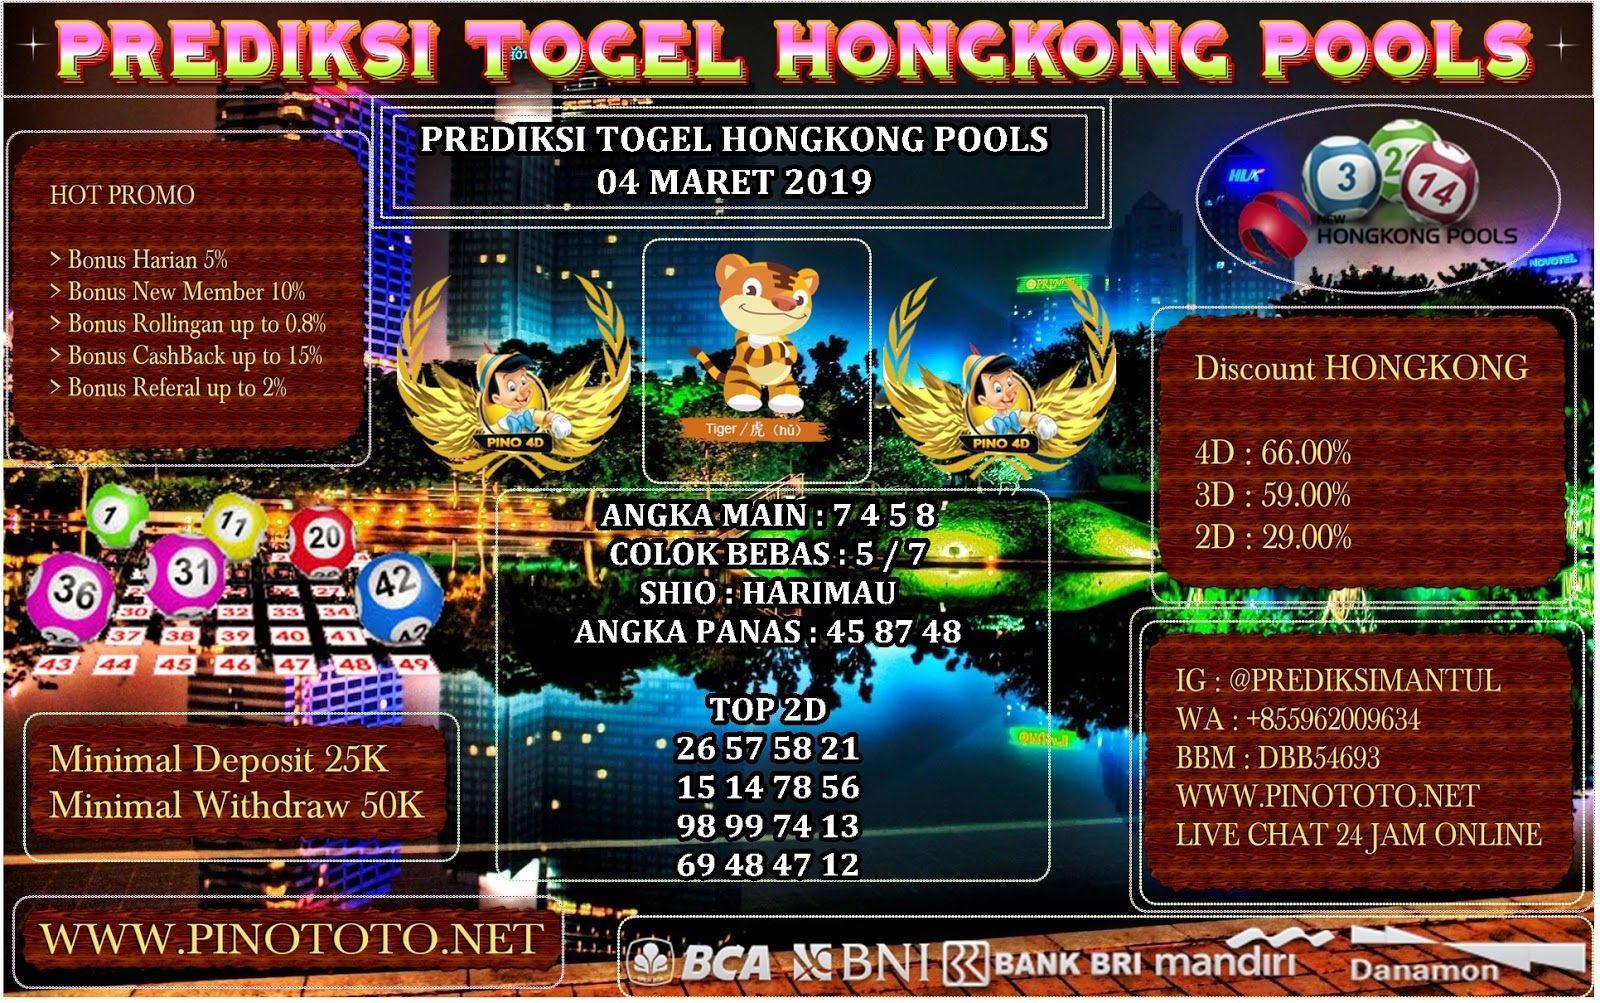 PREDIKSI TOGEL HONGKONG POOLS 04 MARET 2019 ANGKA MAIN : 7 4 5 8